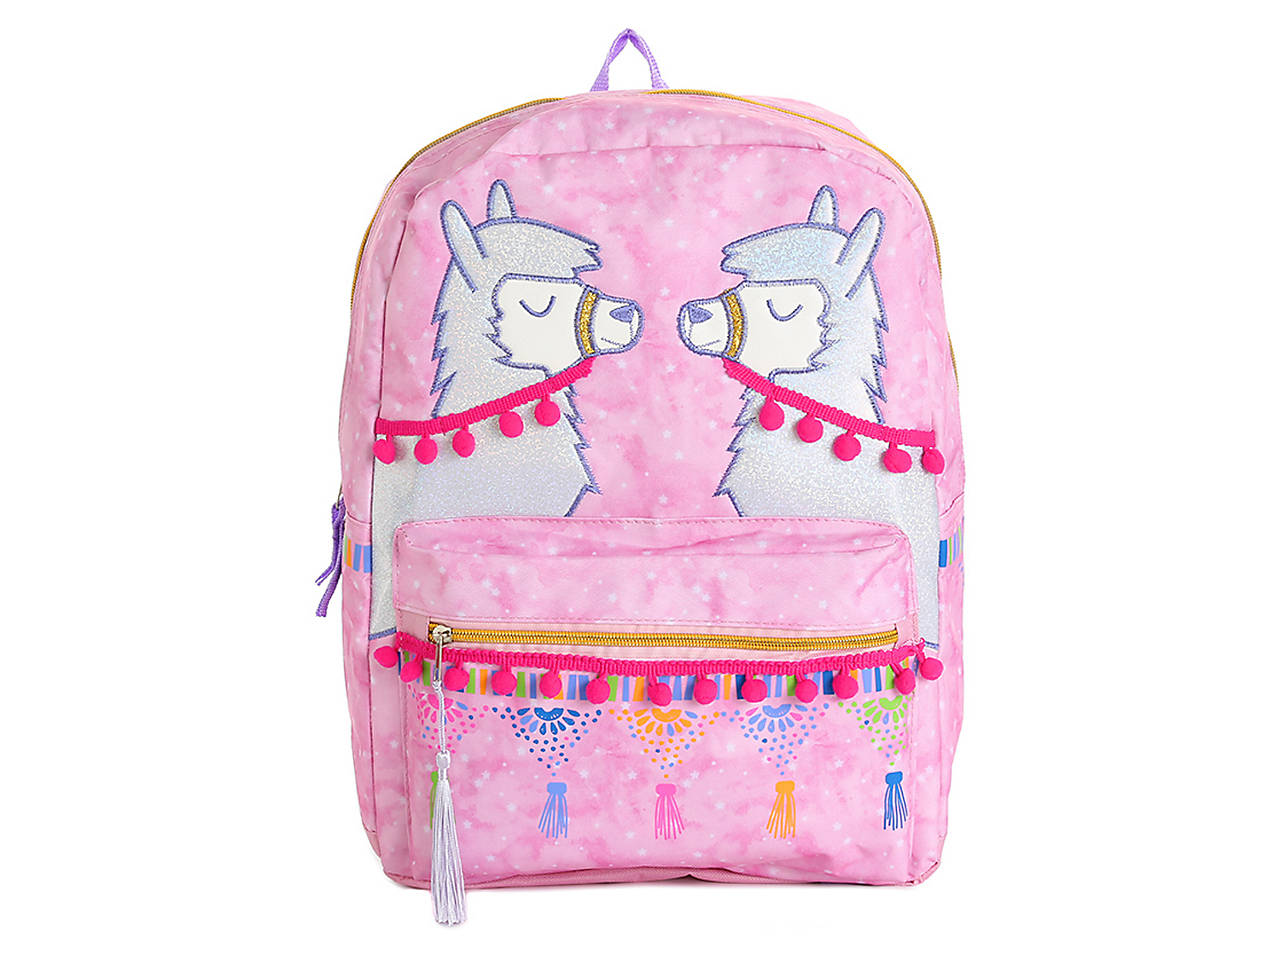 94e868553cc1 Llama Backpack